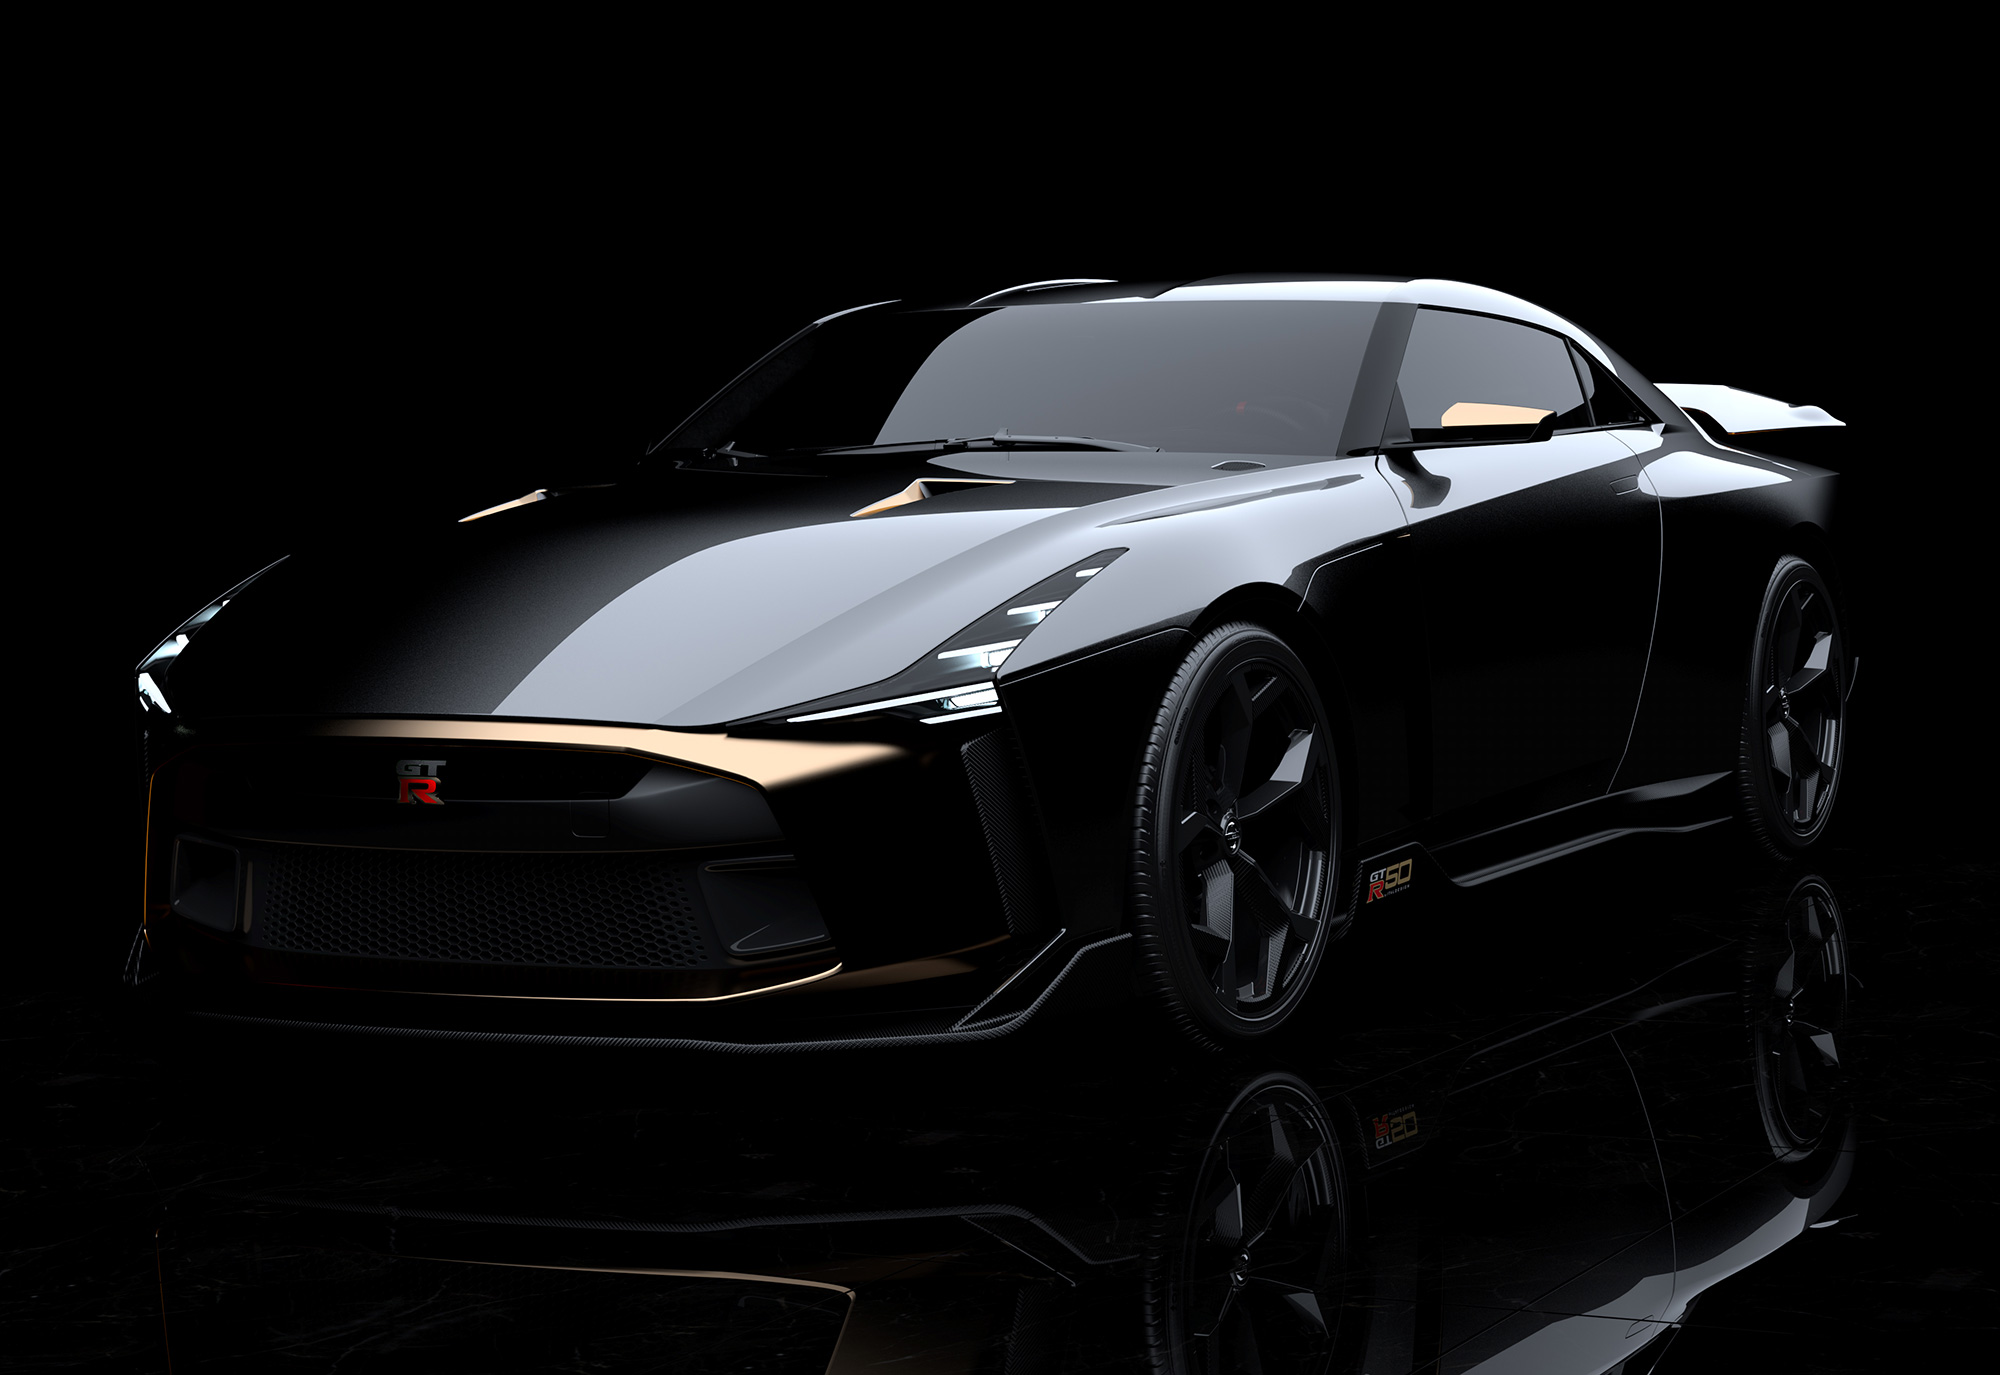 2018-06-26-Nissan-GT-R50-by-Italdesign-EXTERIOR-IMAGE-1.jpg